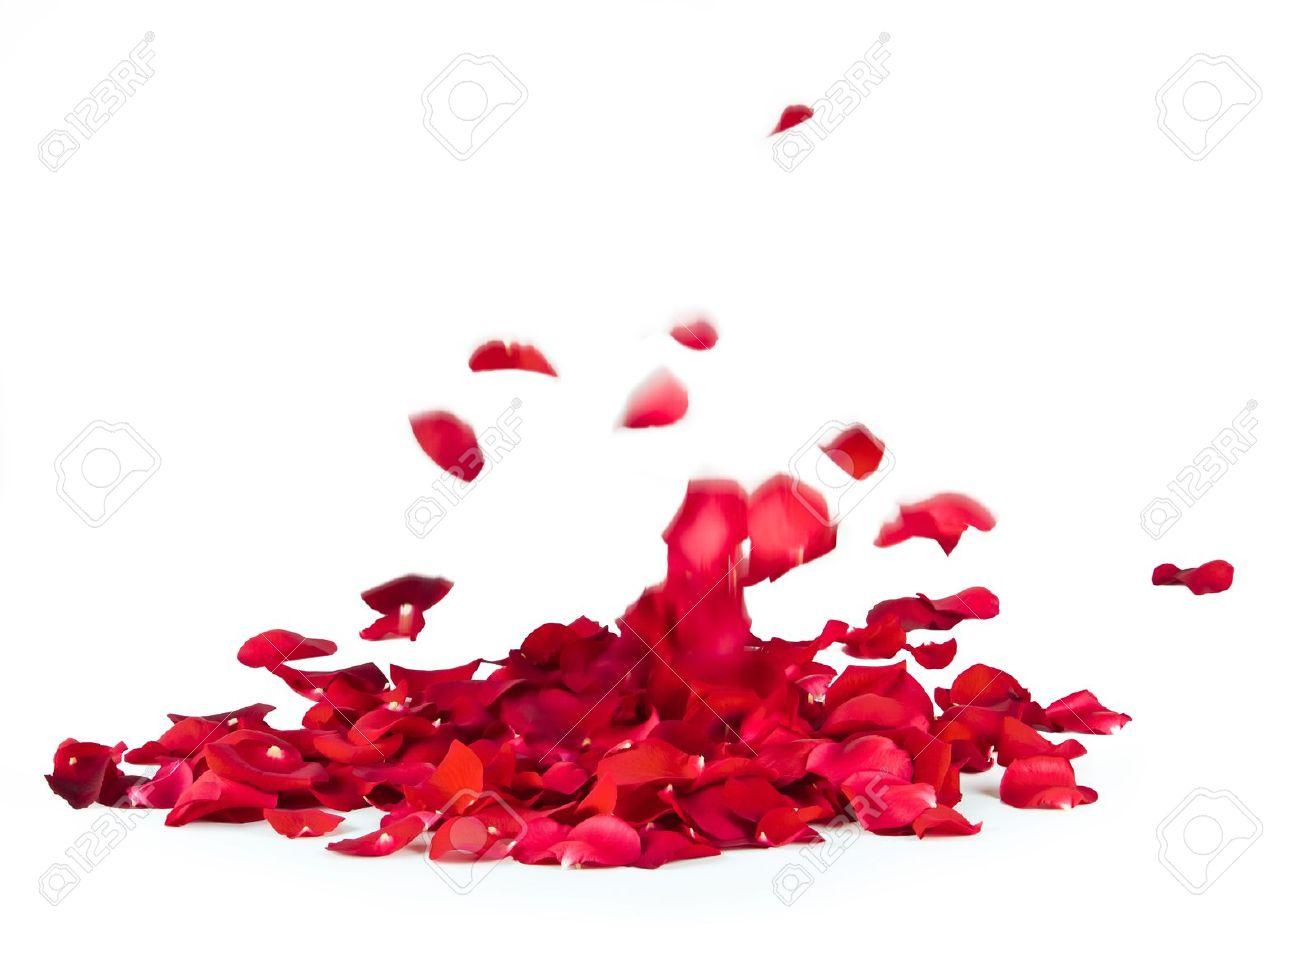 falling rose petals on